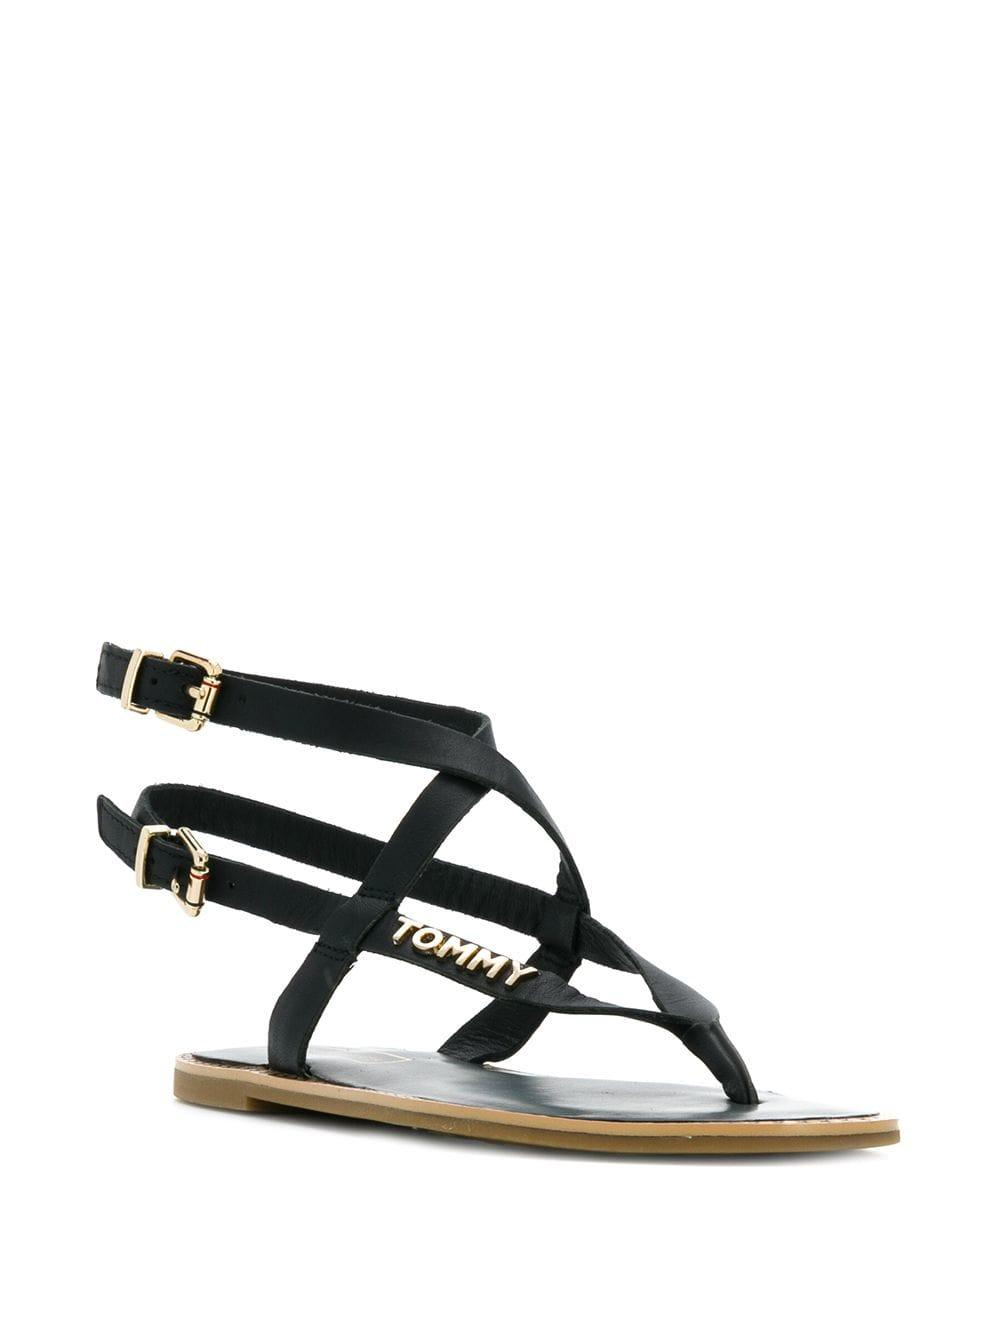 ad5a9dd0711a Lyst - Tommy Hilfiger Strappy Sandals in Black